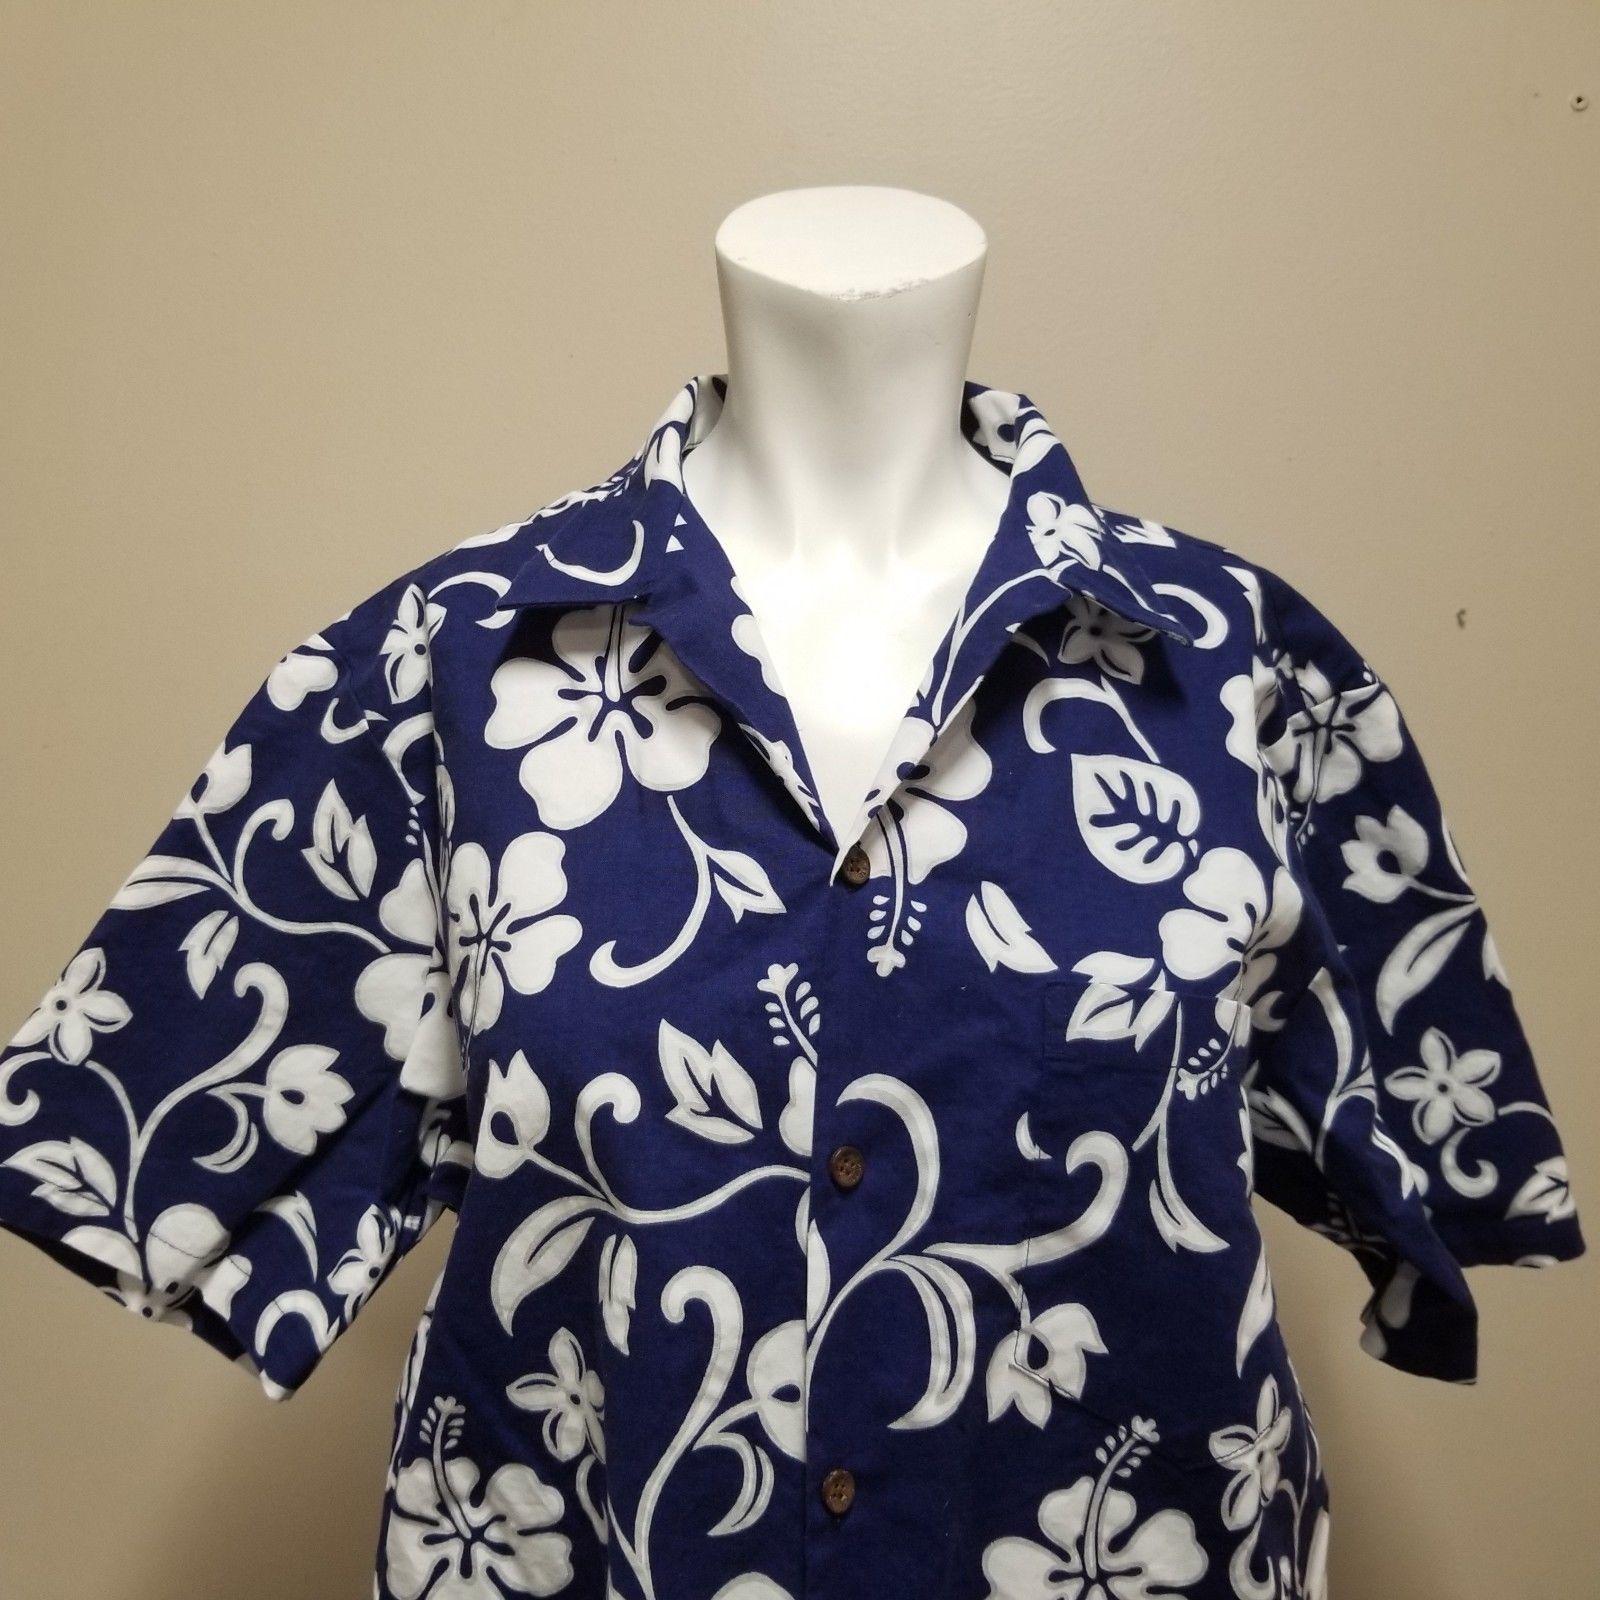 727fcb5d RJC Hawaiian Aloha Camp Shirt Men's Size L and 38 similar items. S l1600